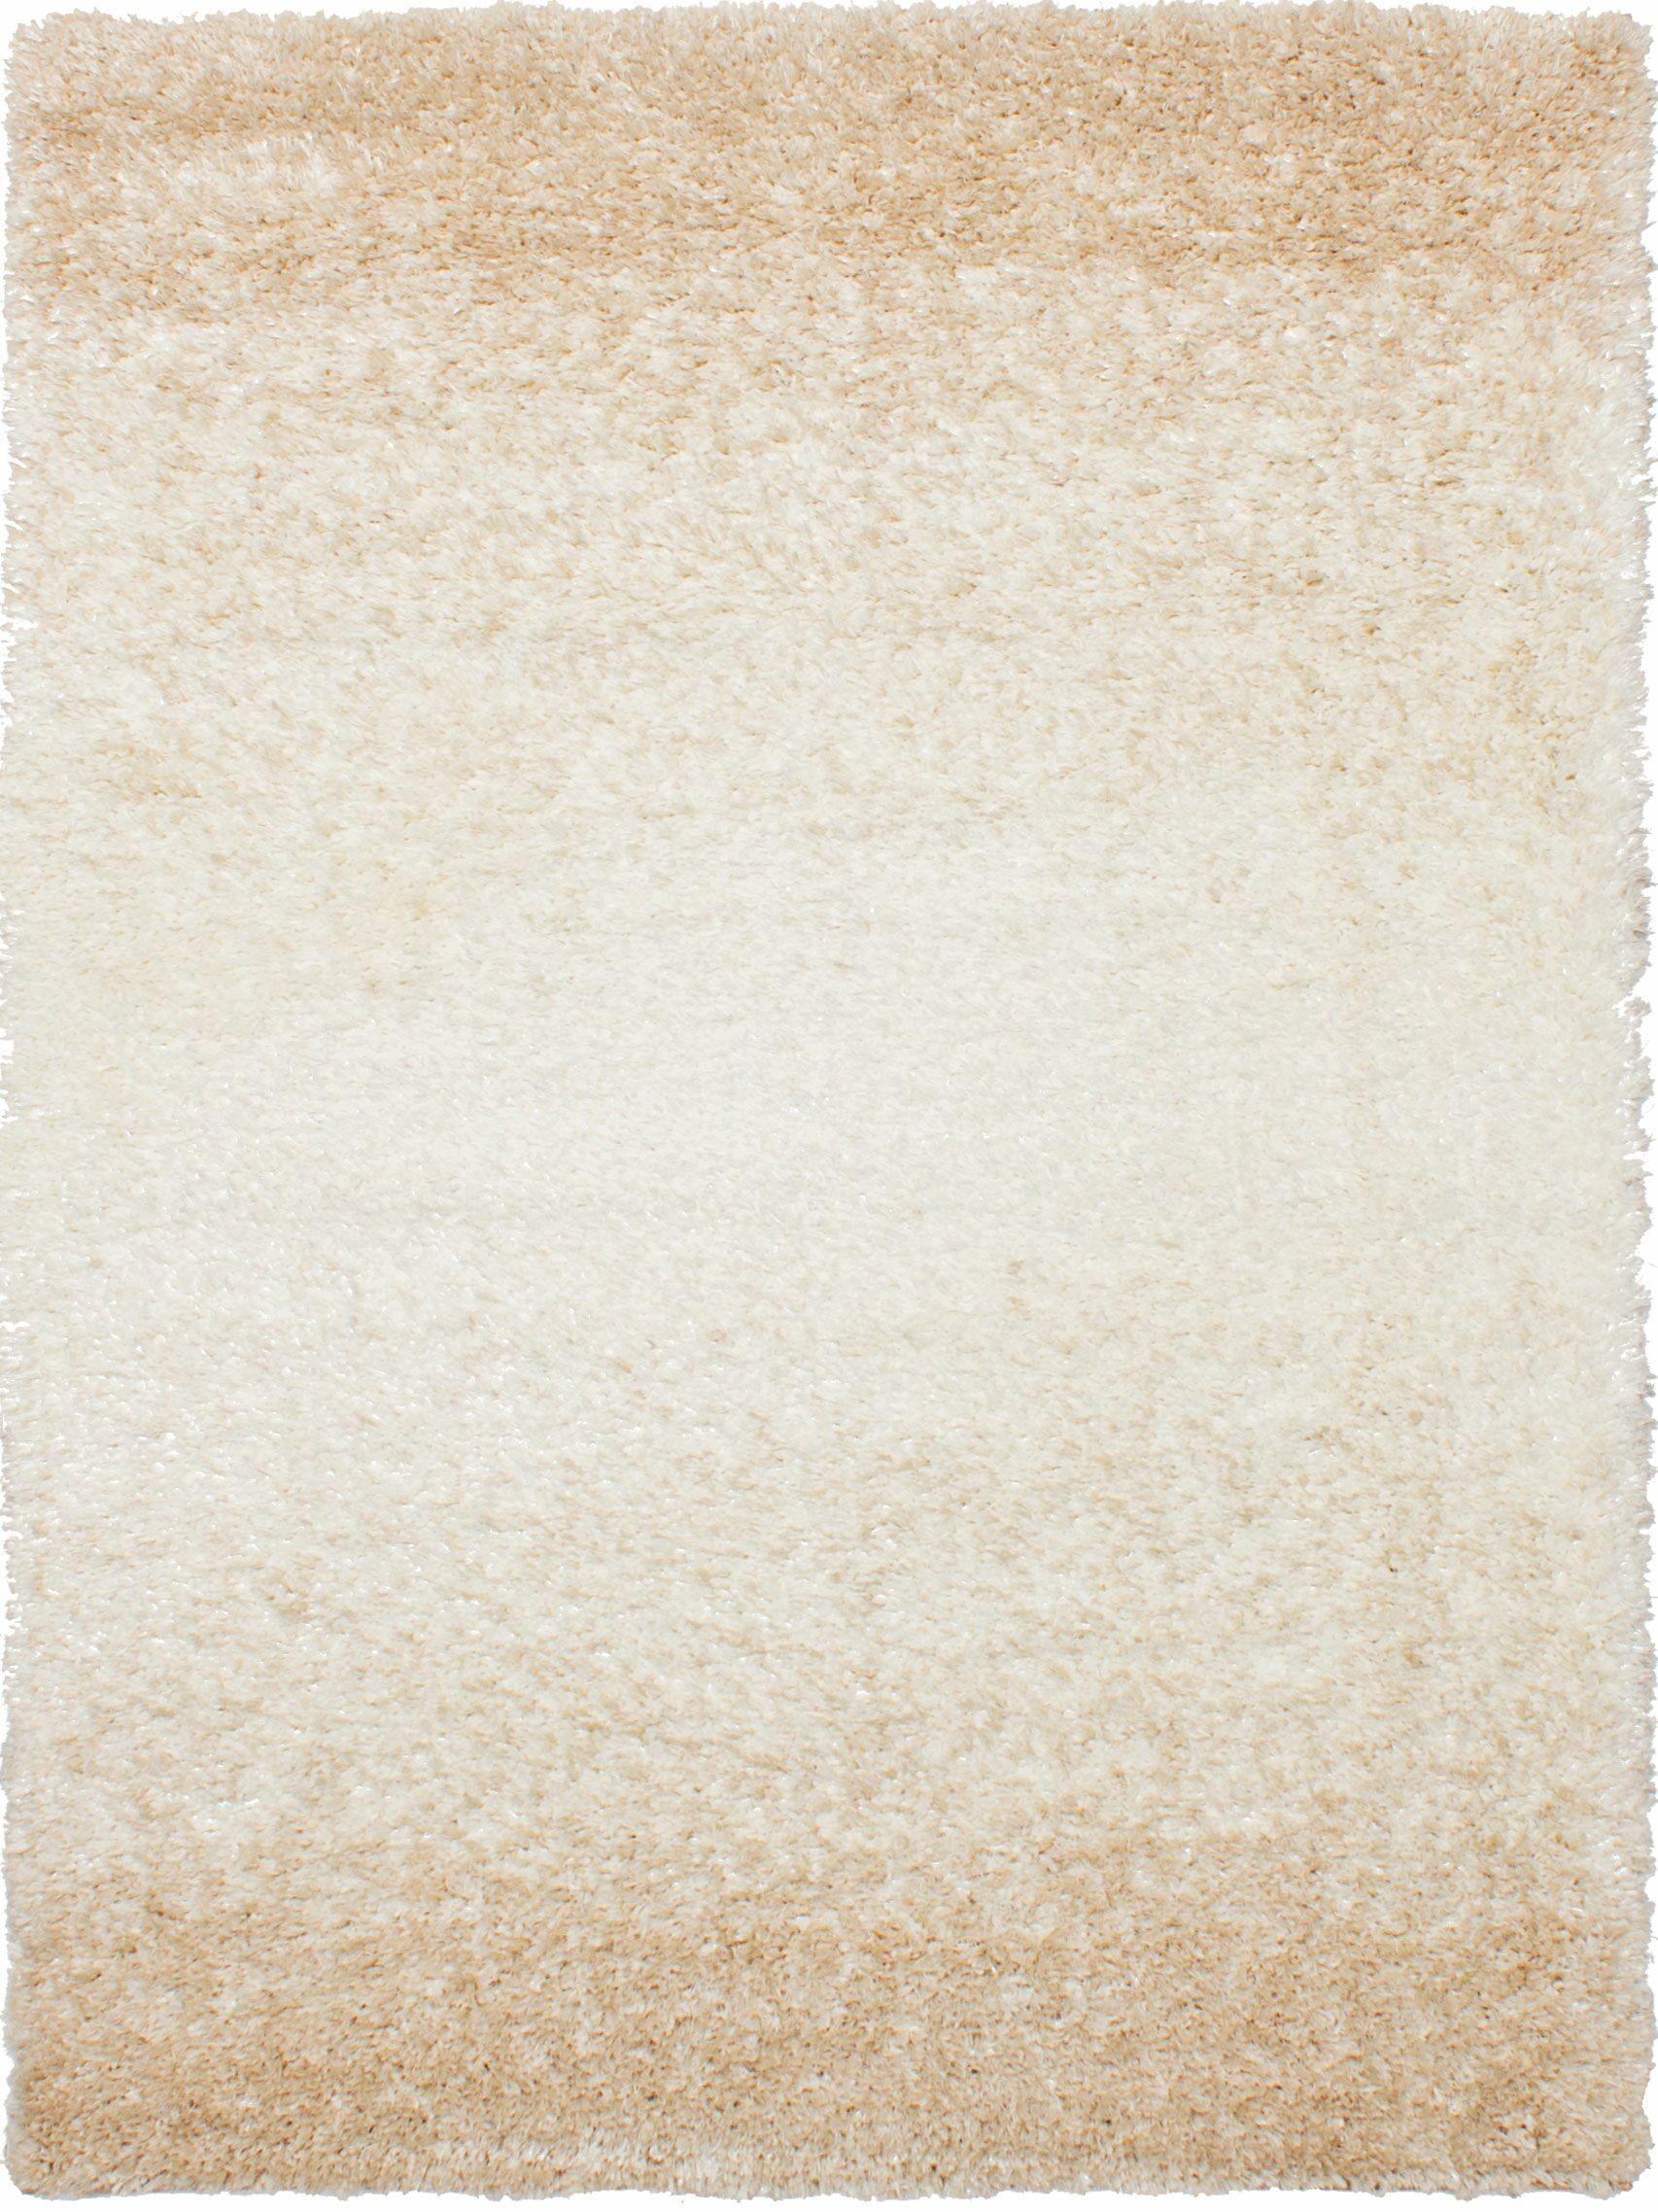 Corbett Beige/Cream Area Rug